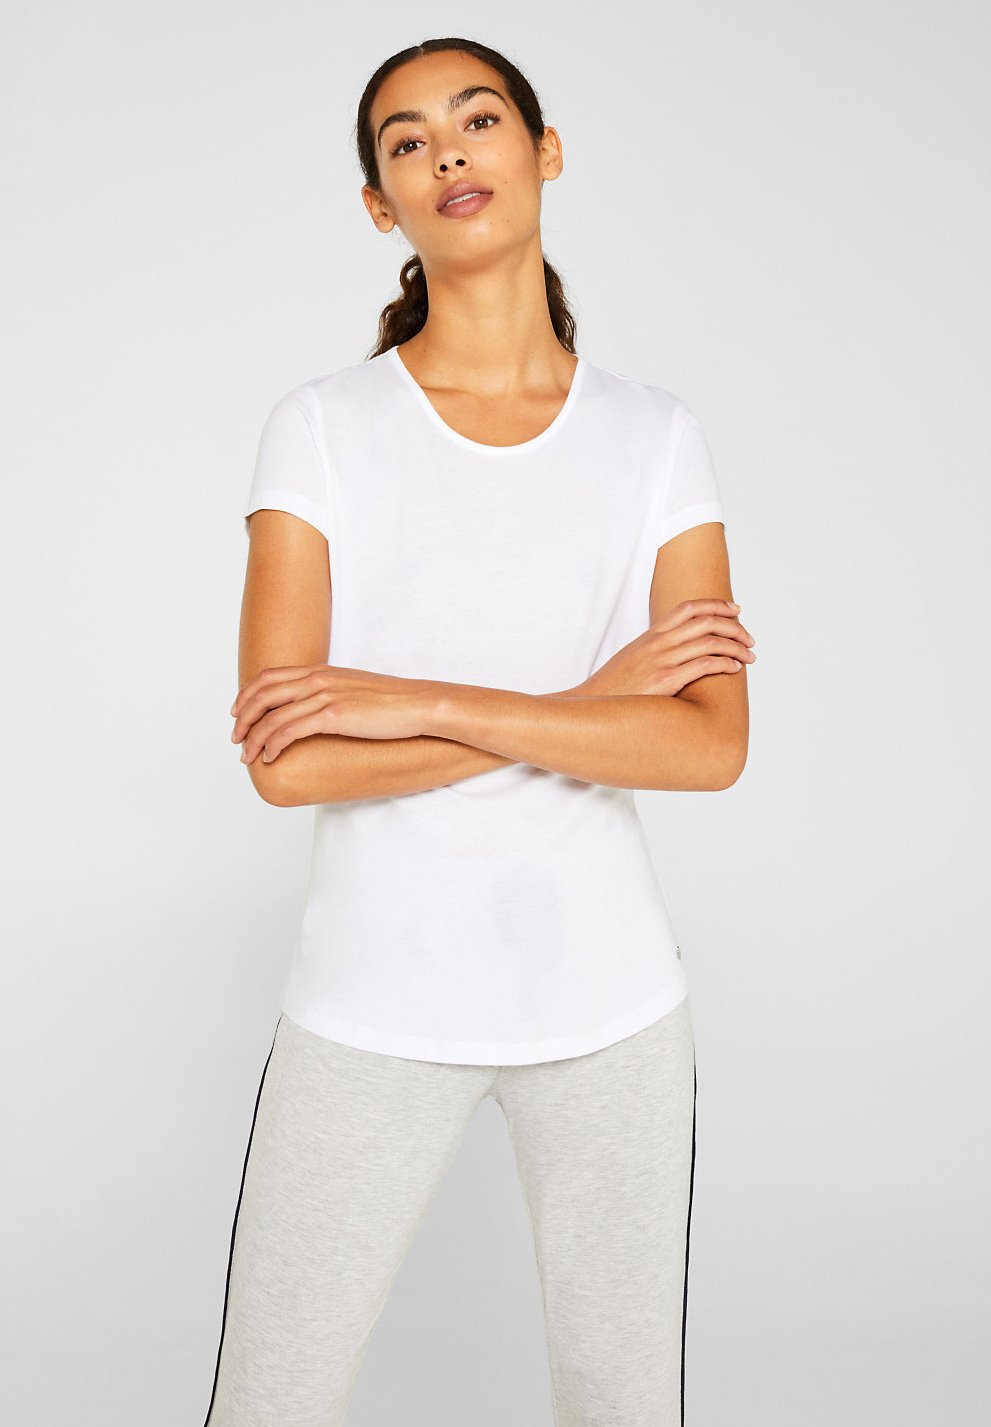 Damen FASHION - Nachtwäsche Shirt